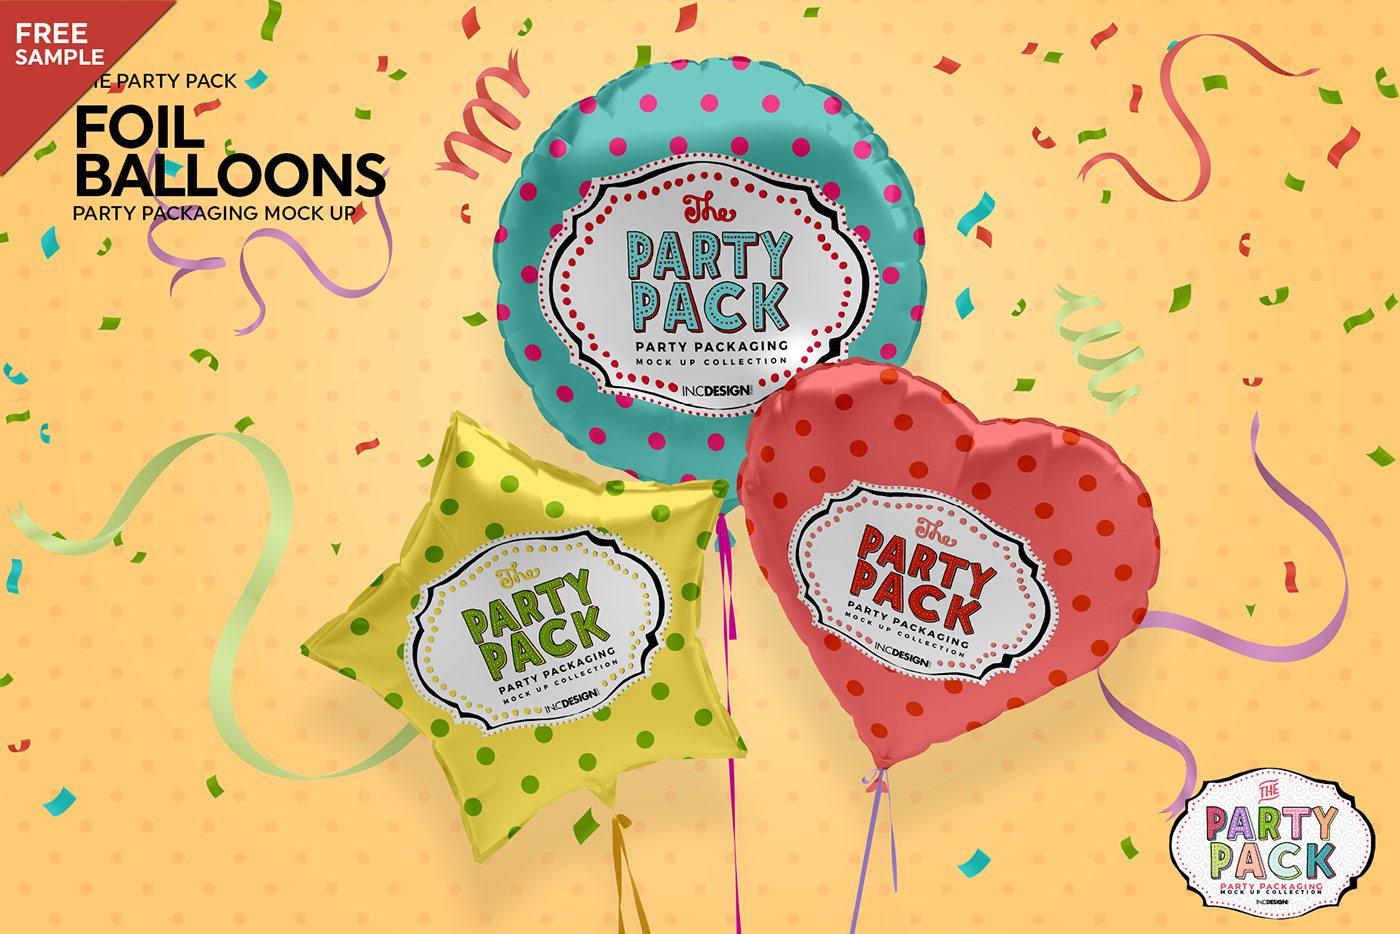 Free Foil Balloons Mockup